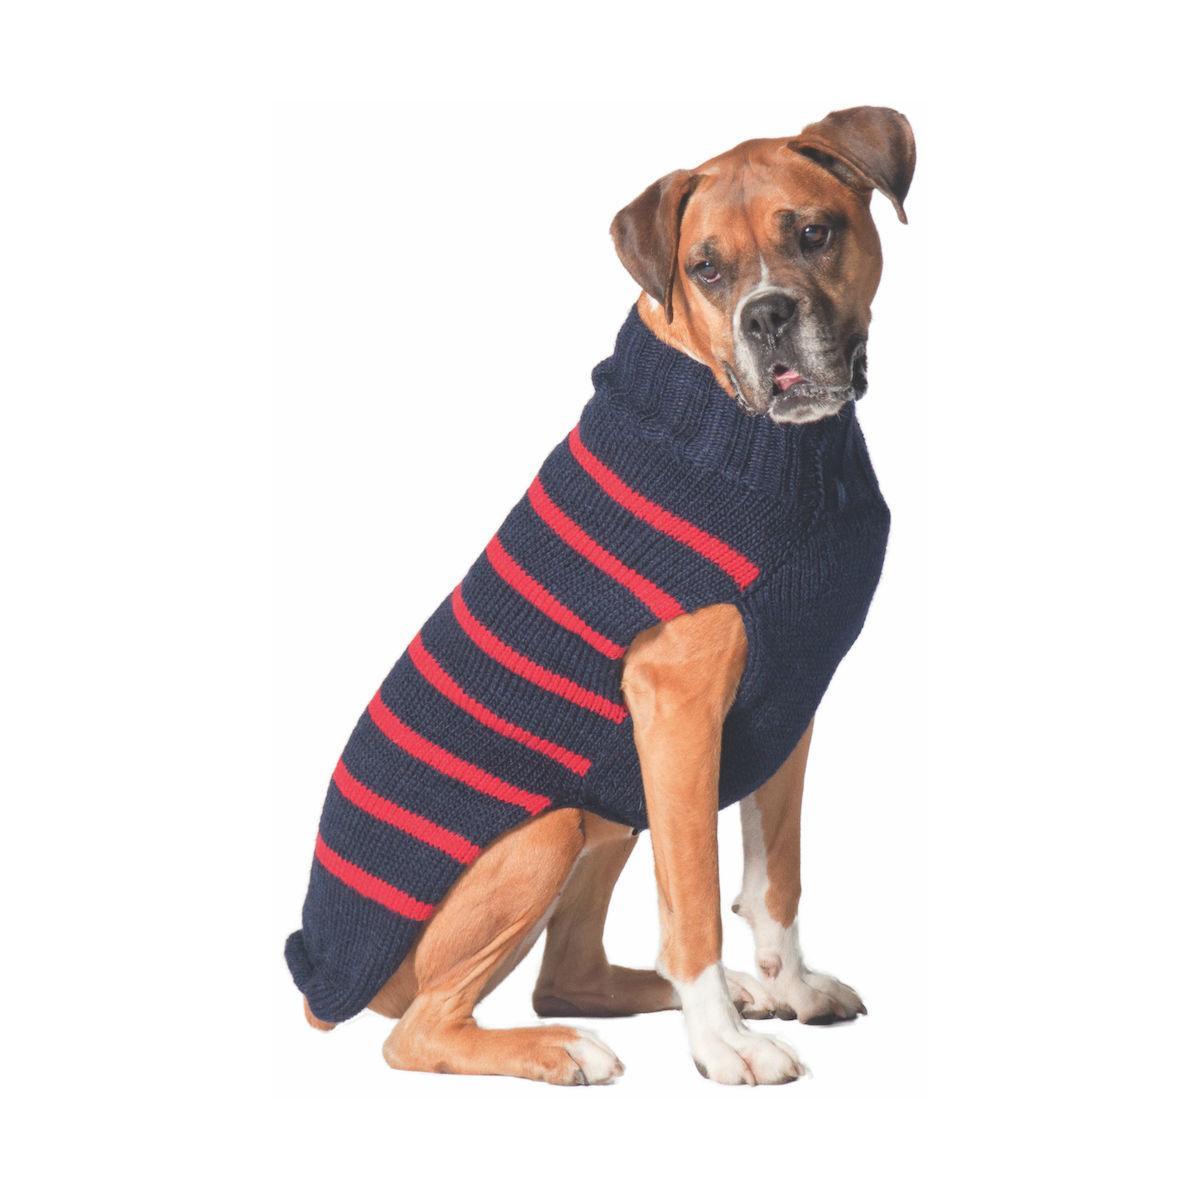 Handmade Alpaca Classic Stripe Dog Sweater - Navy and Red